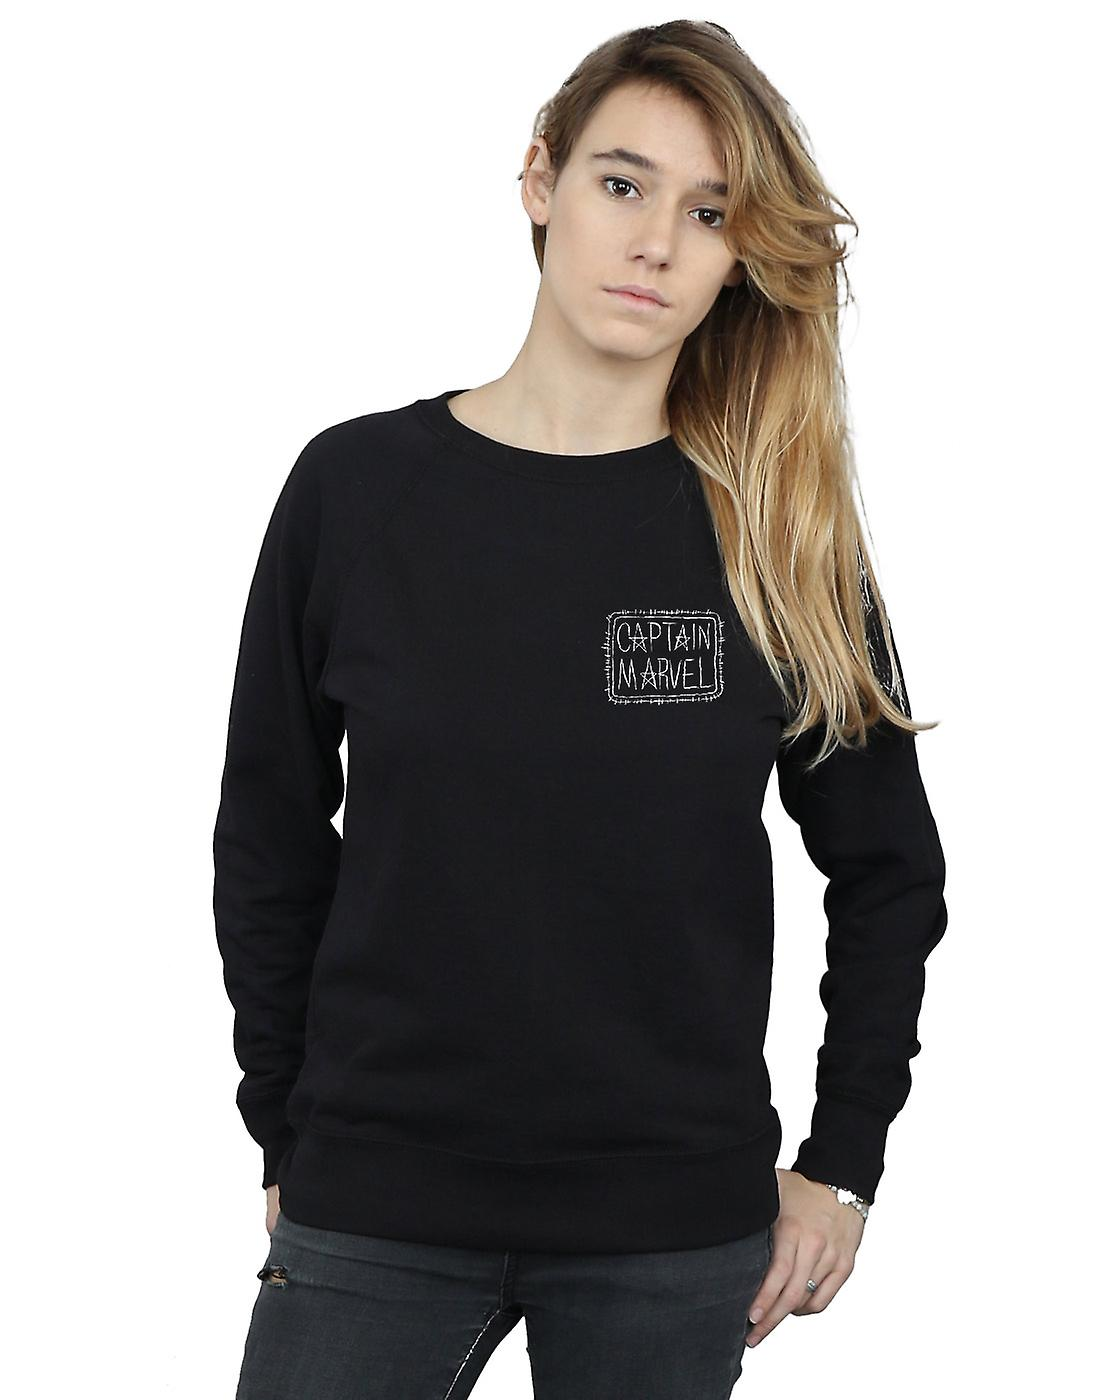 Marvel Women's Captain Marvel Breast Patch Sweatshirt